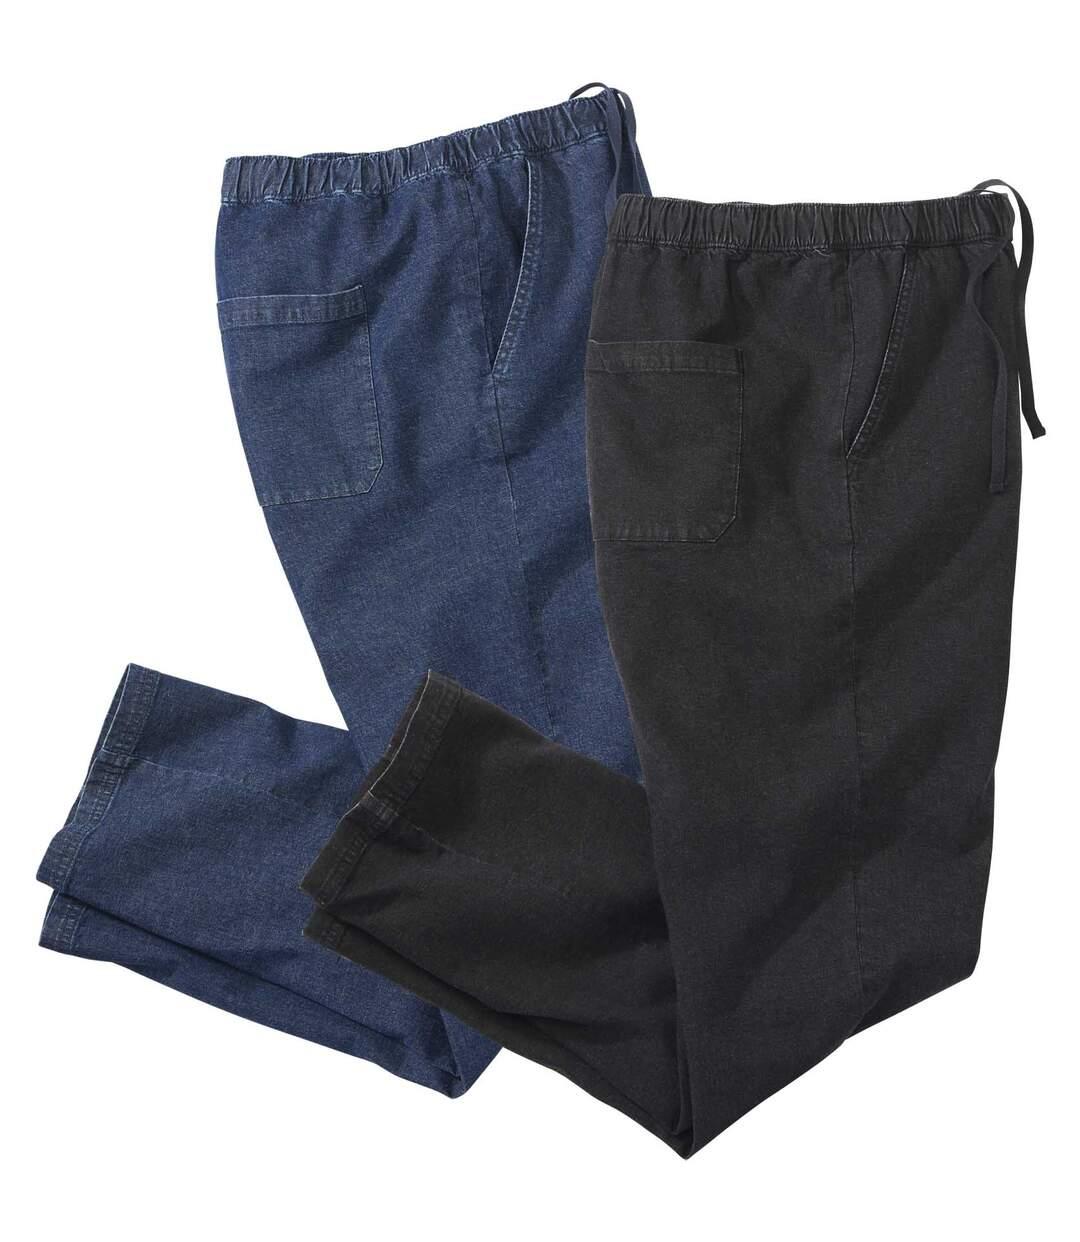 Set van 2 comfortabele stretch jeans